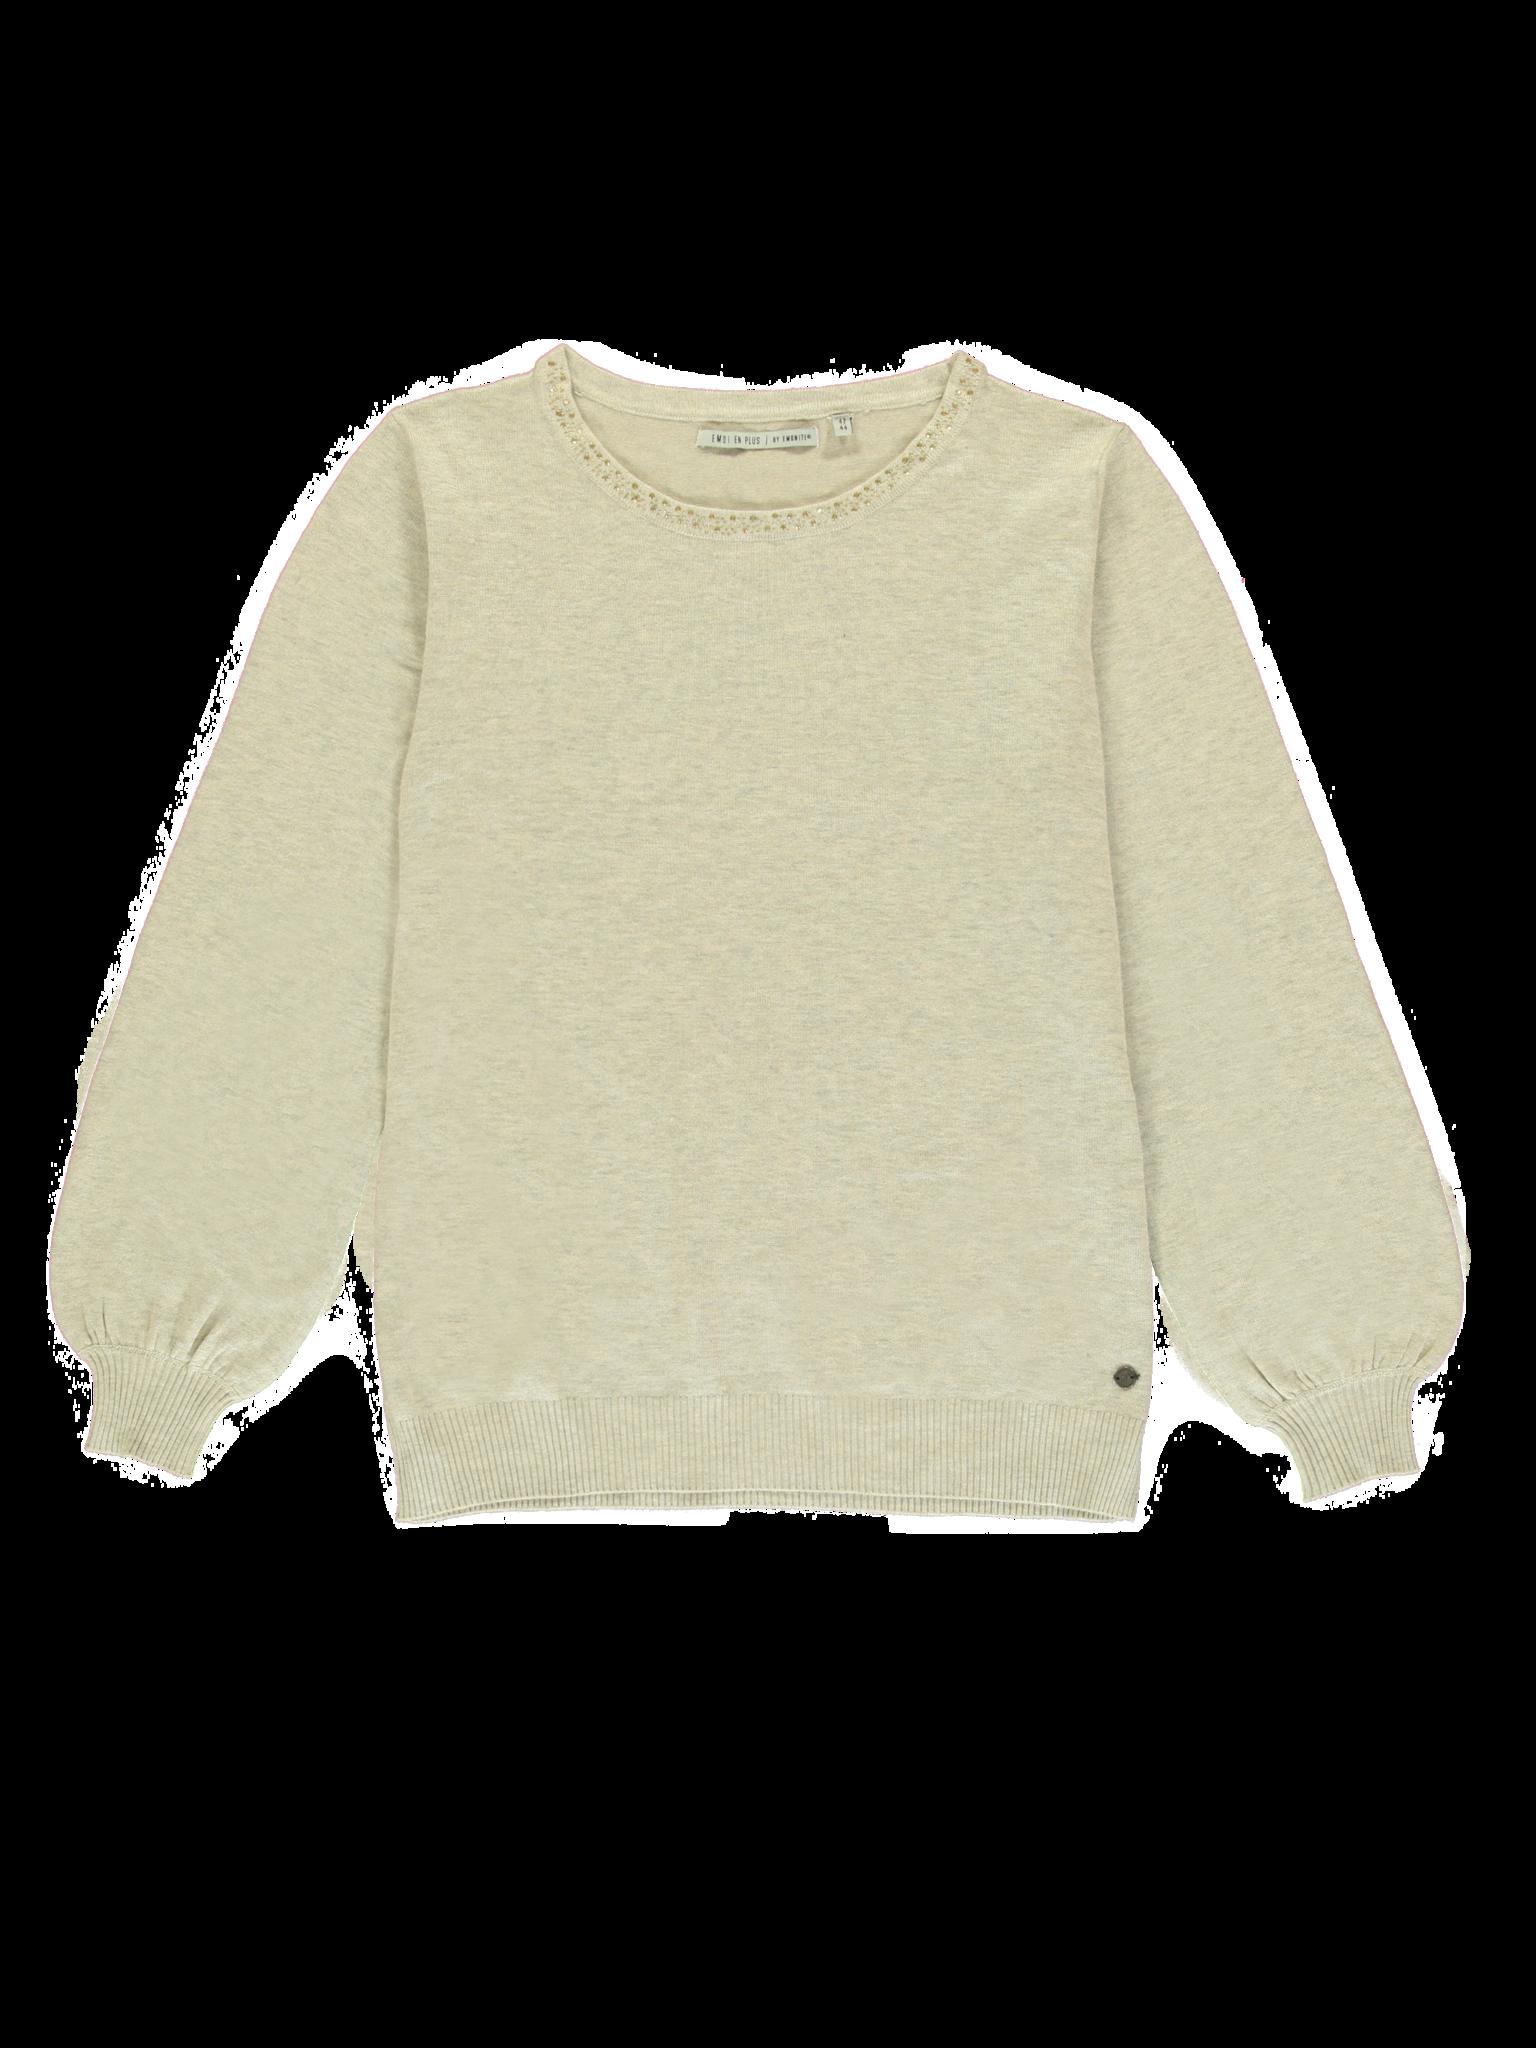 All Brands | Winterproducts Ladies+ | Pull | 24 pcs/box